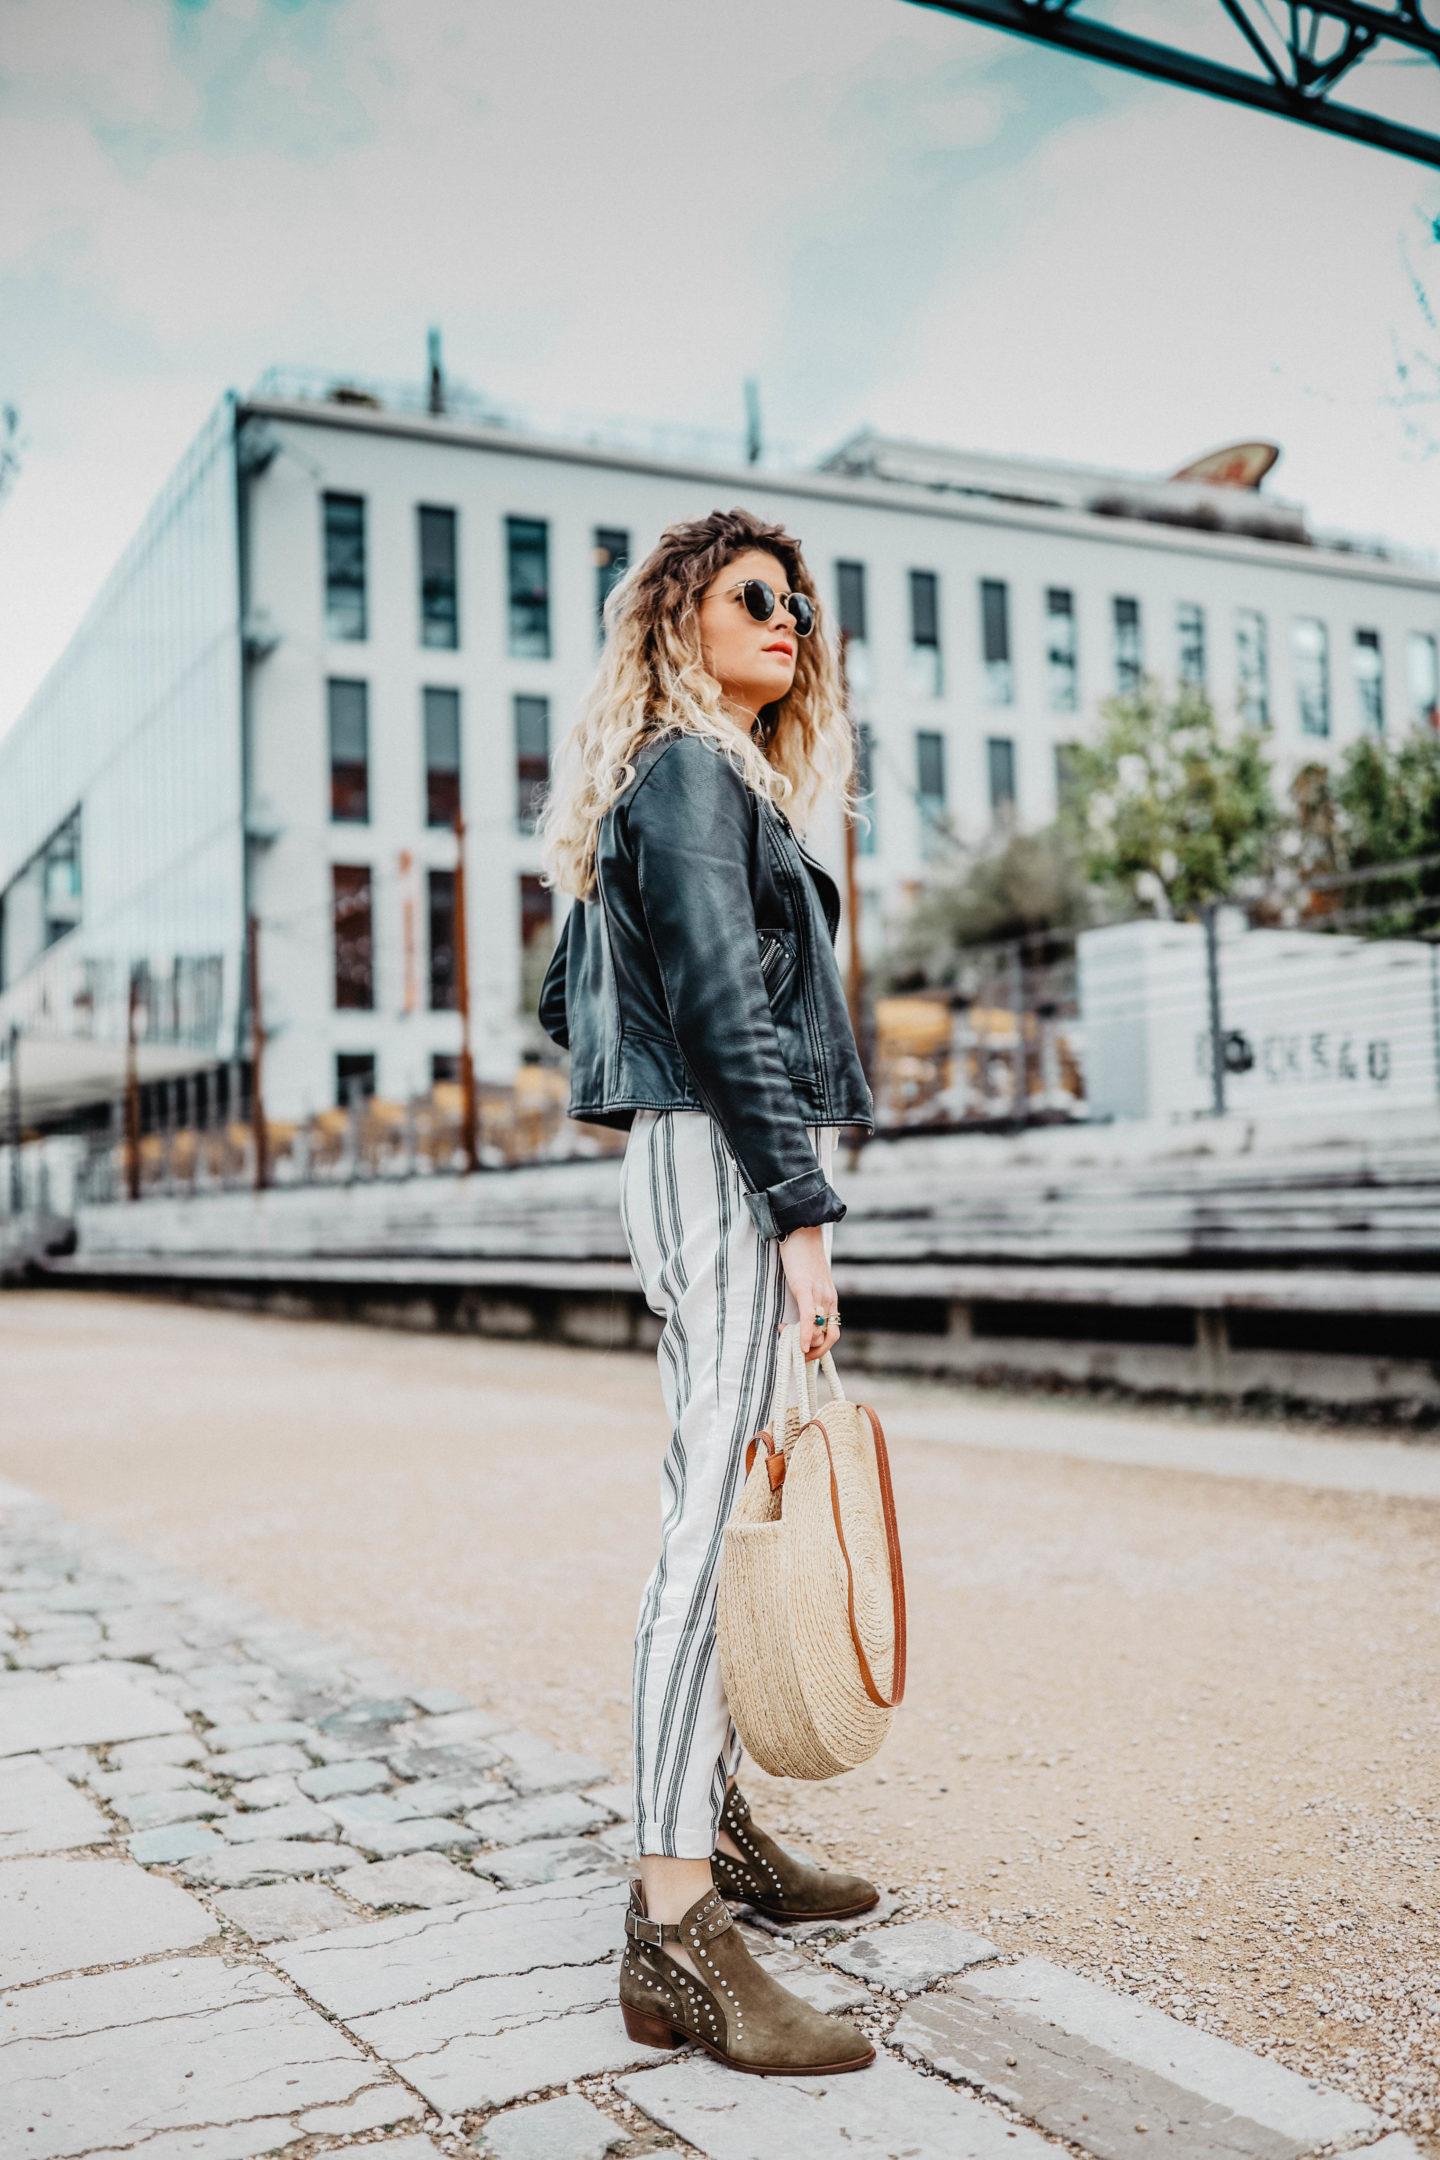 Pantalon taille haute Bershka marie and mood blogueuse mode